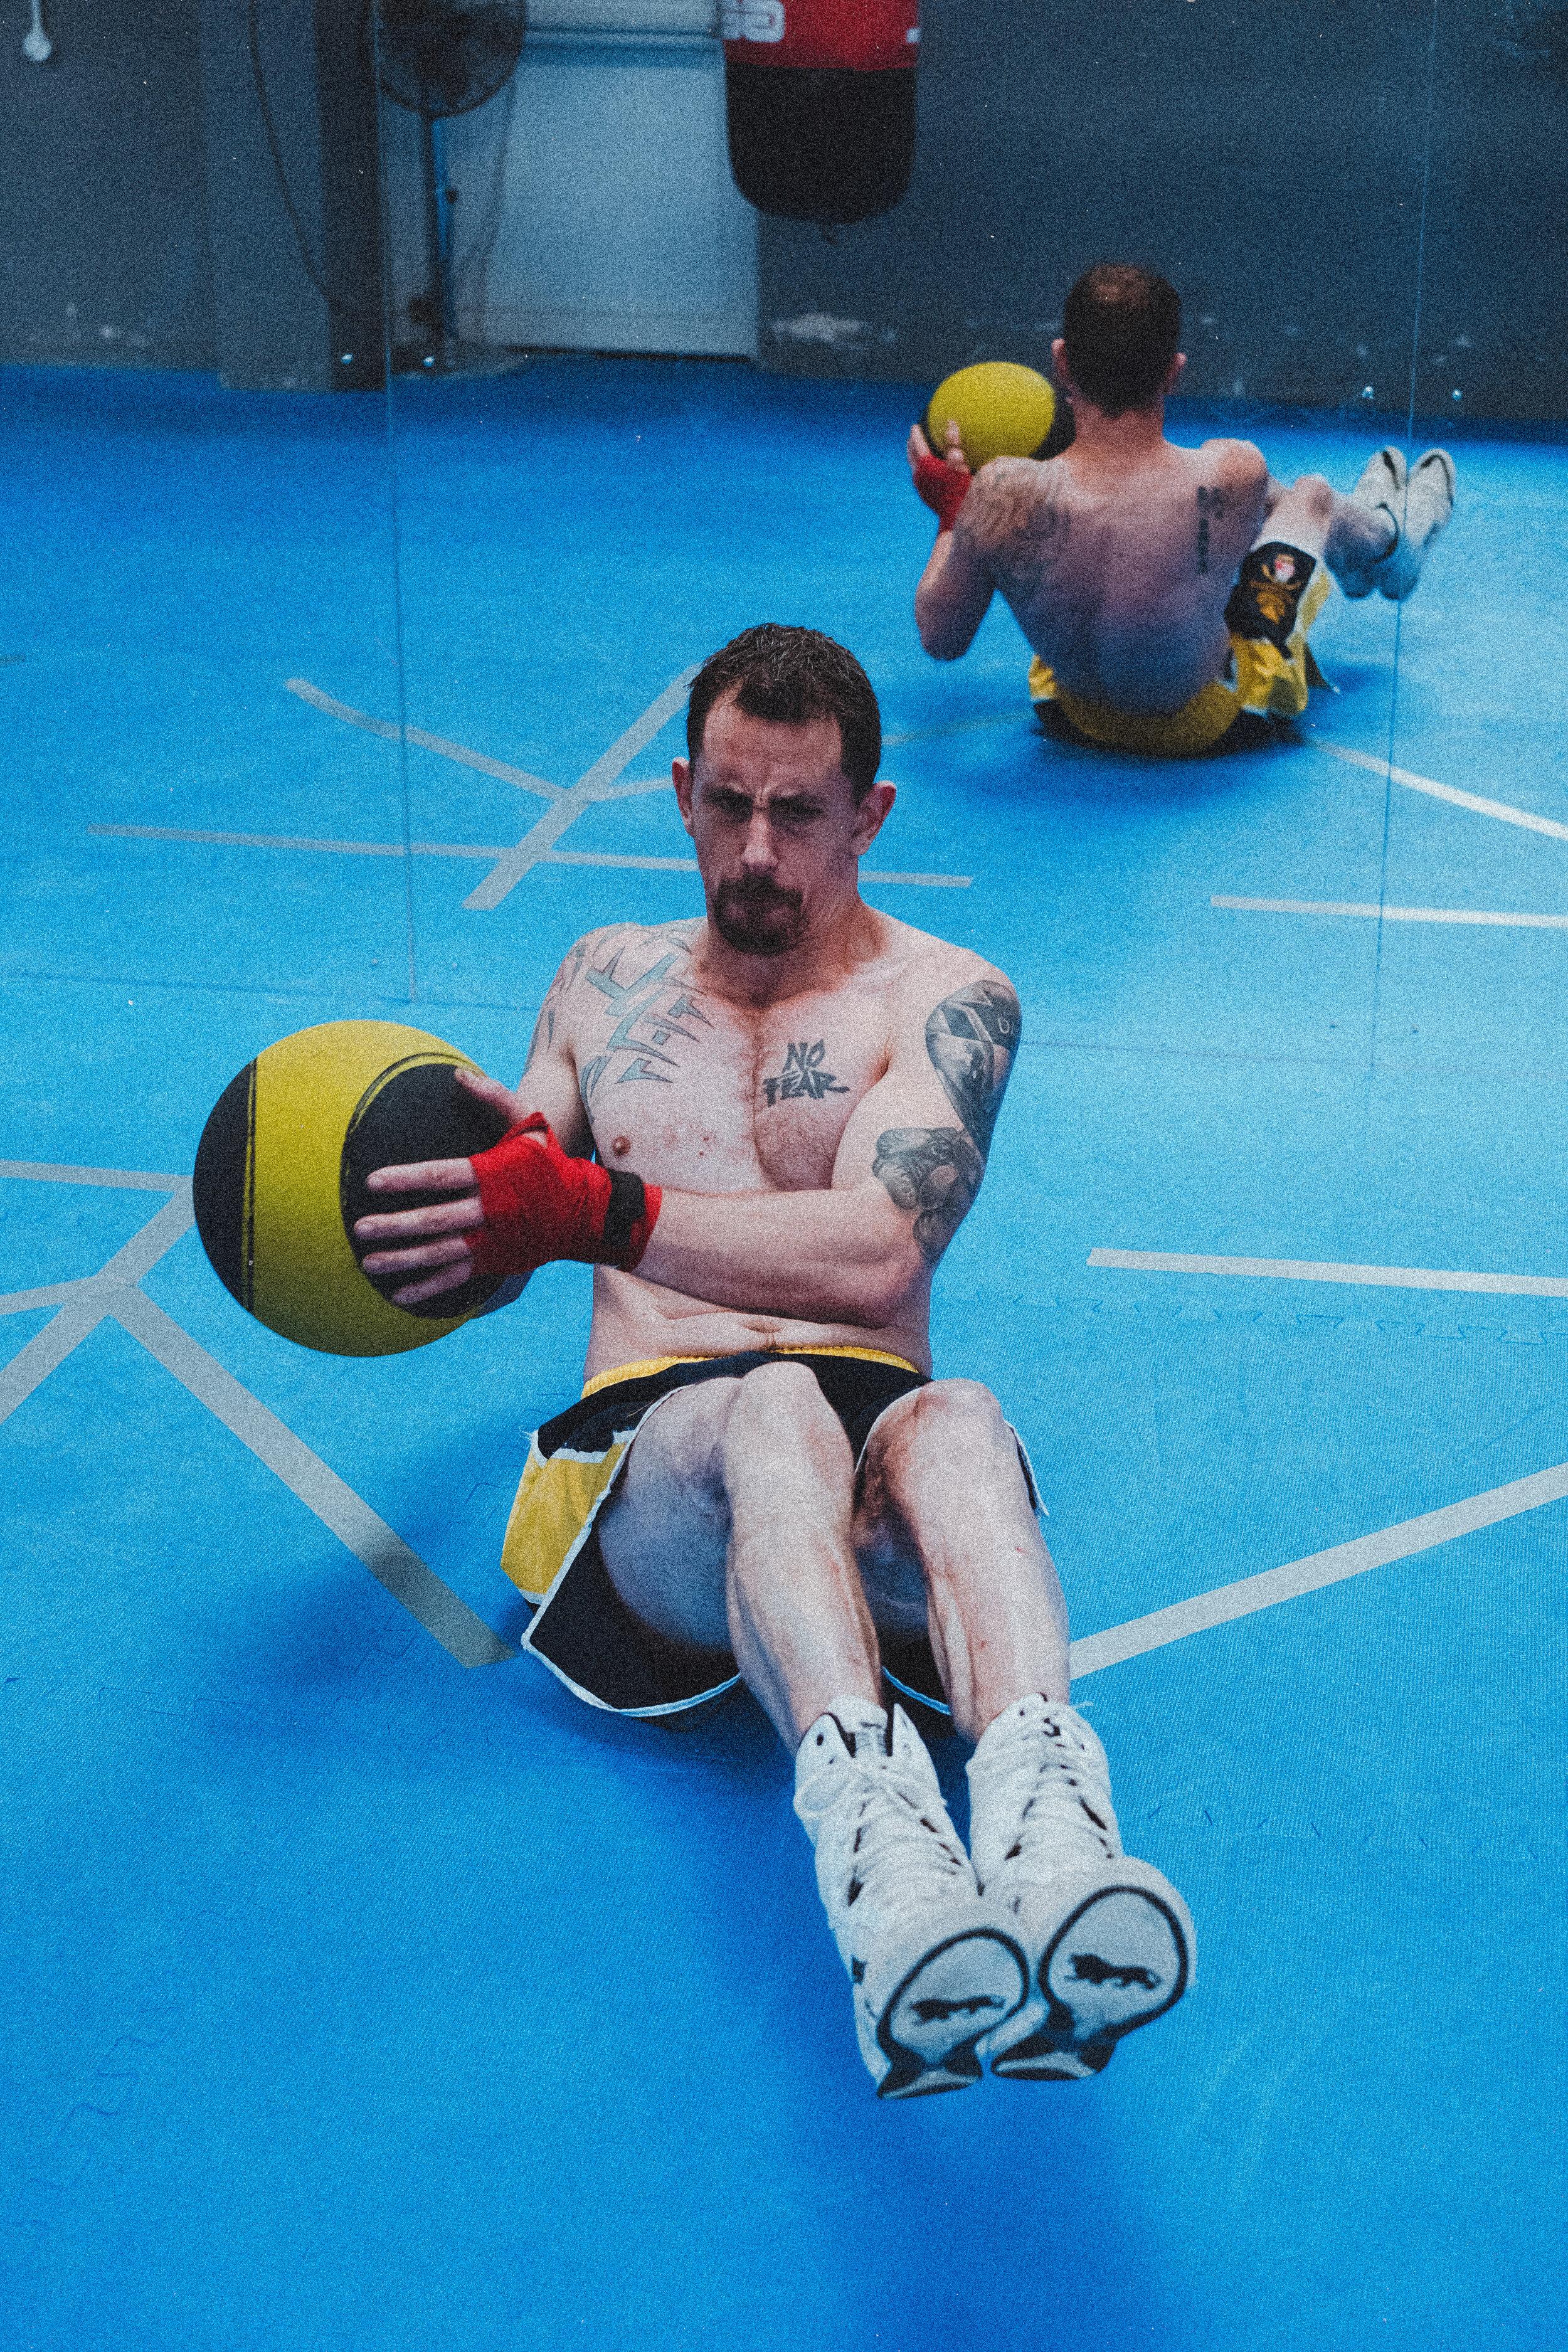 brett boxing session october 2019 (13).jpg